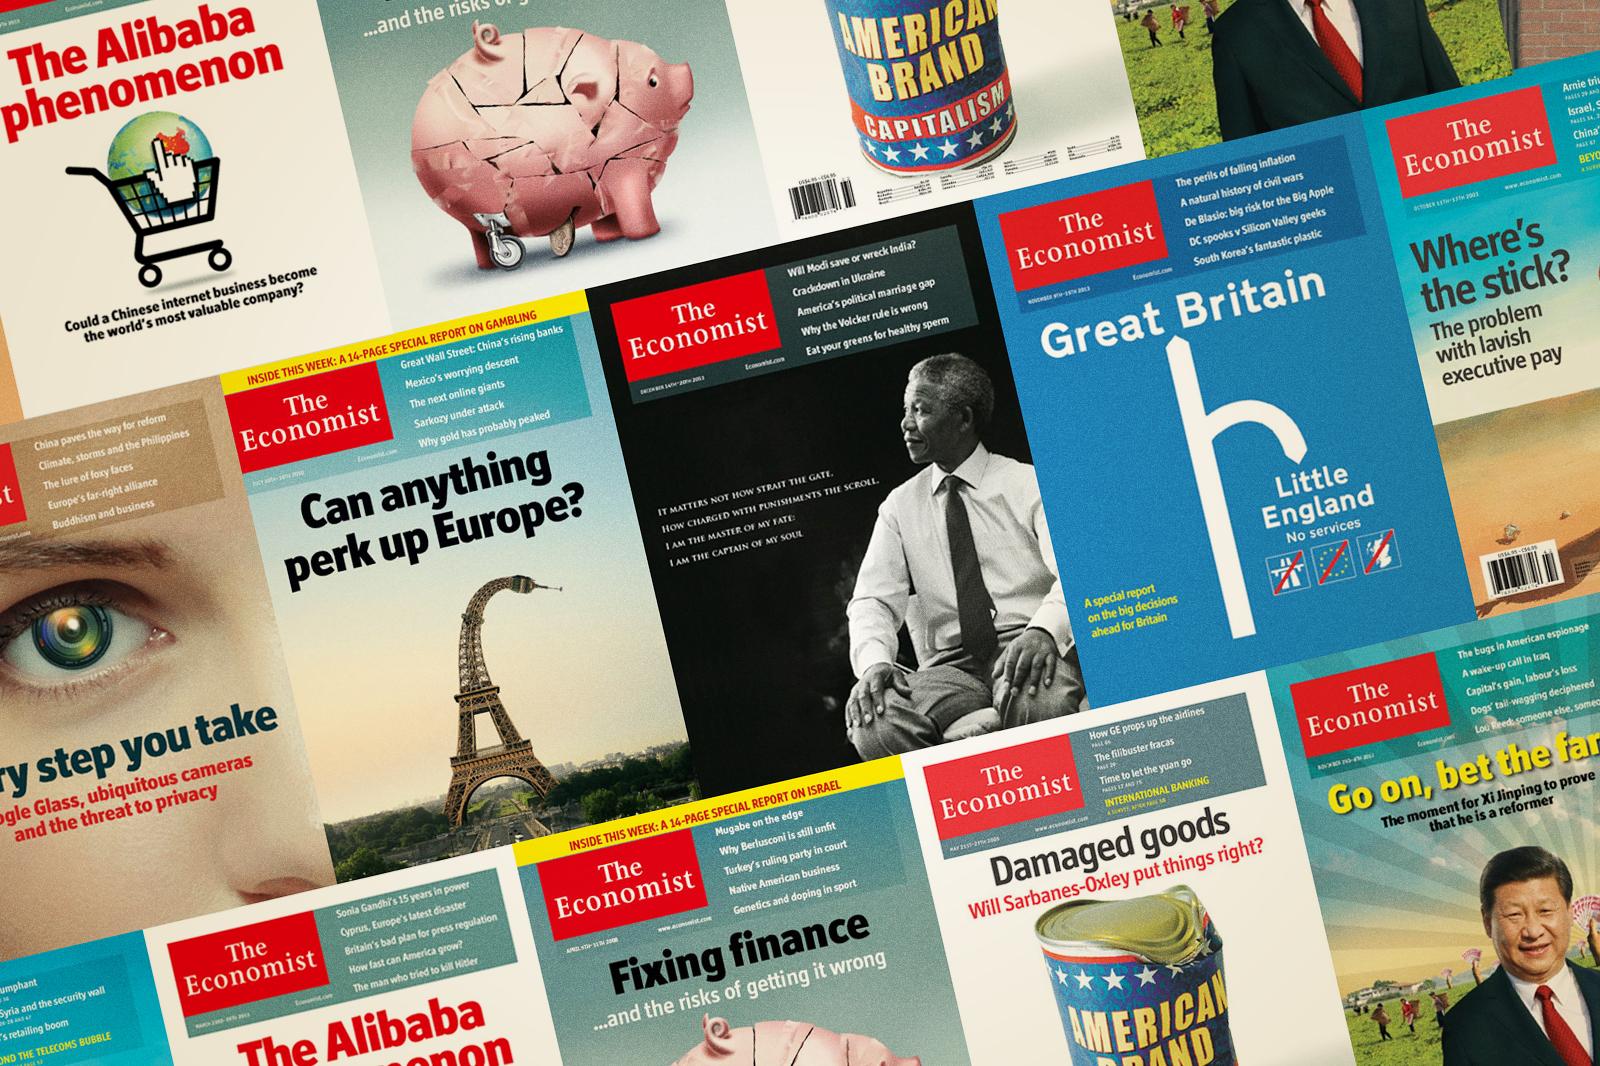 Direct Marketing - The Economist